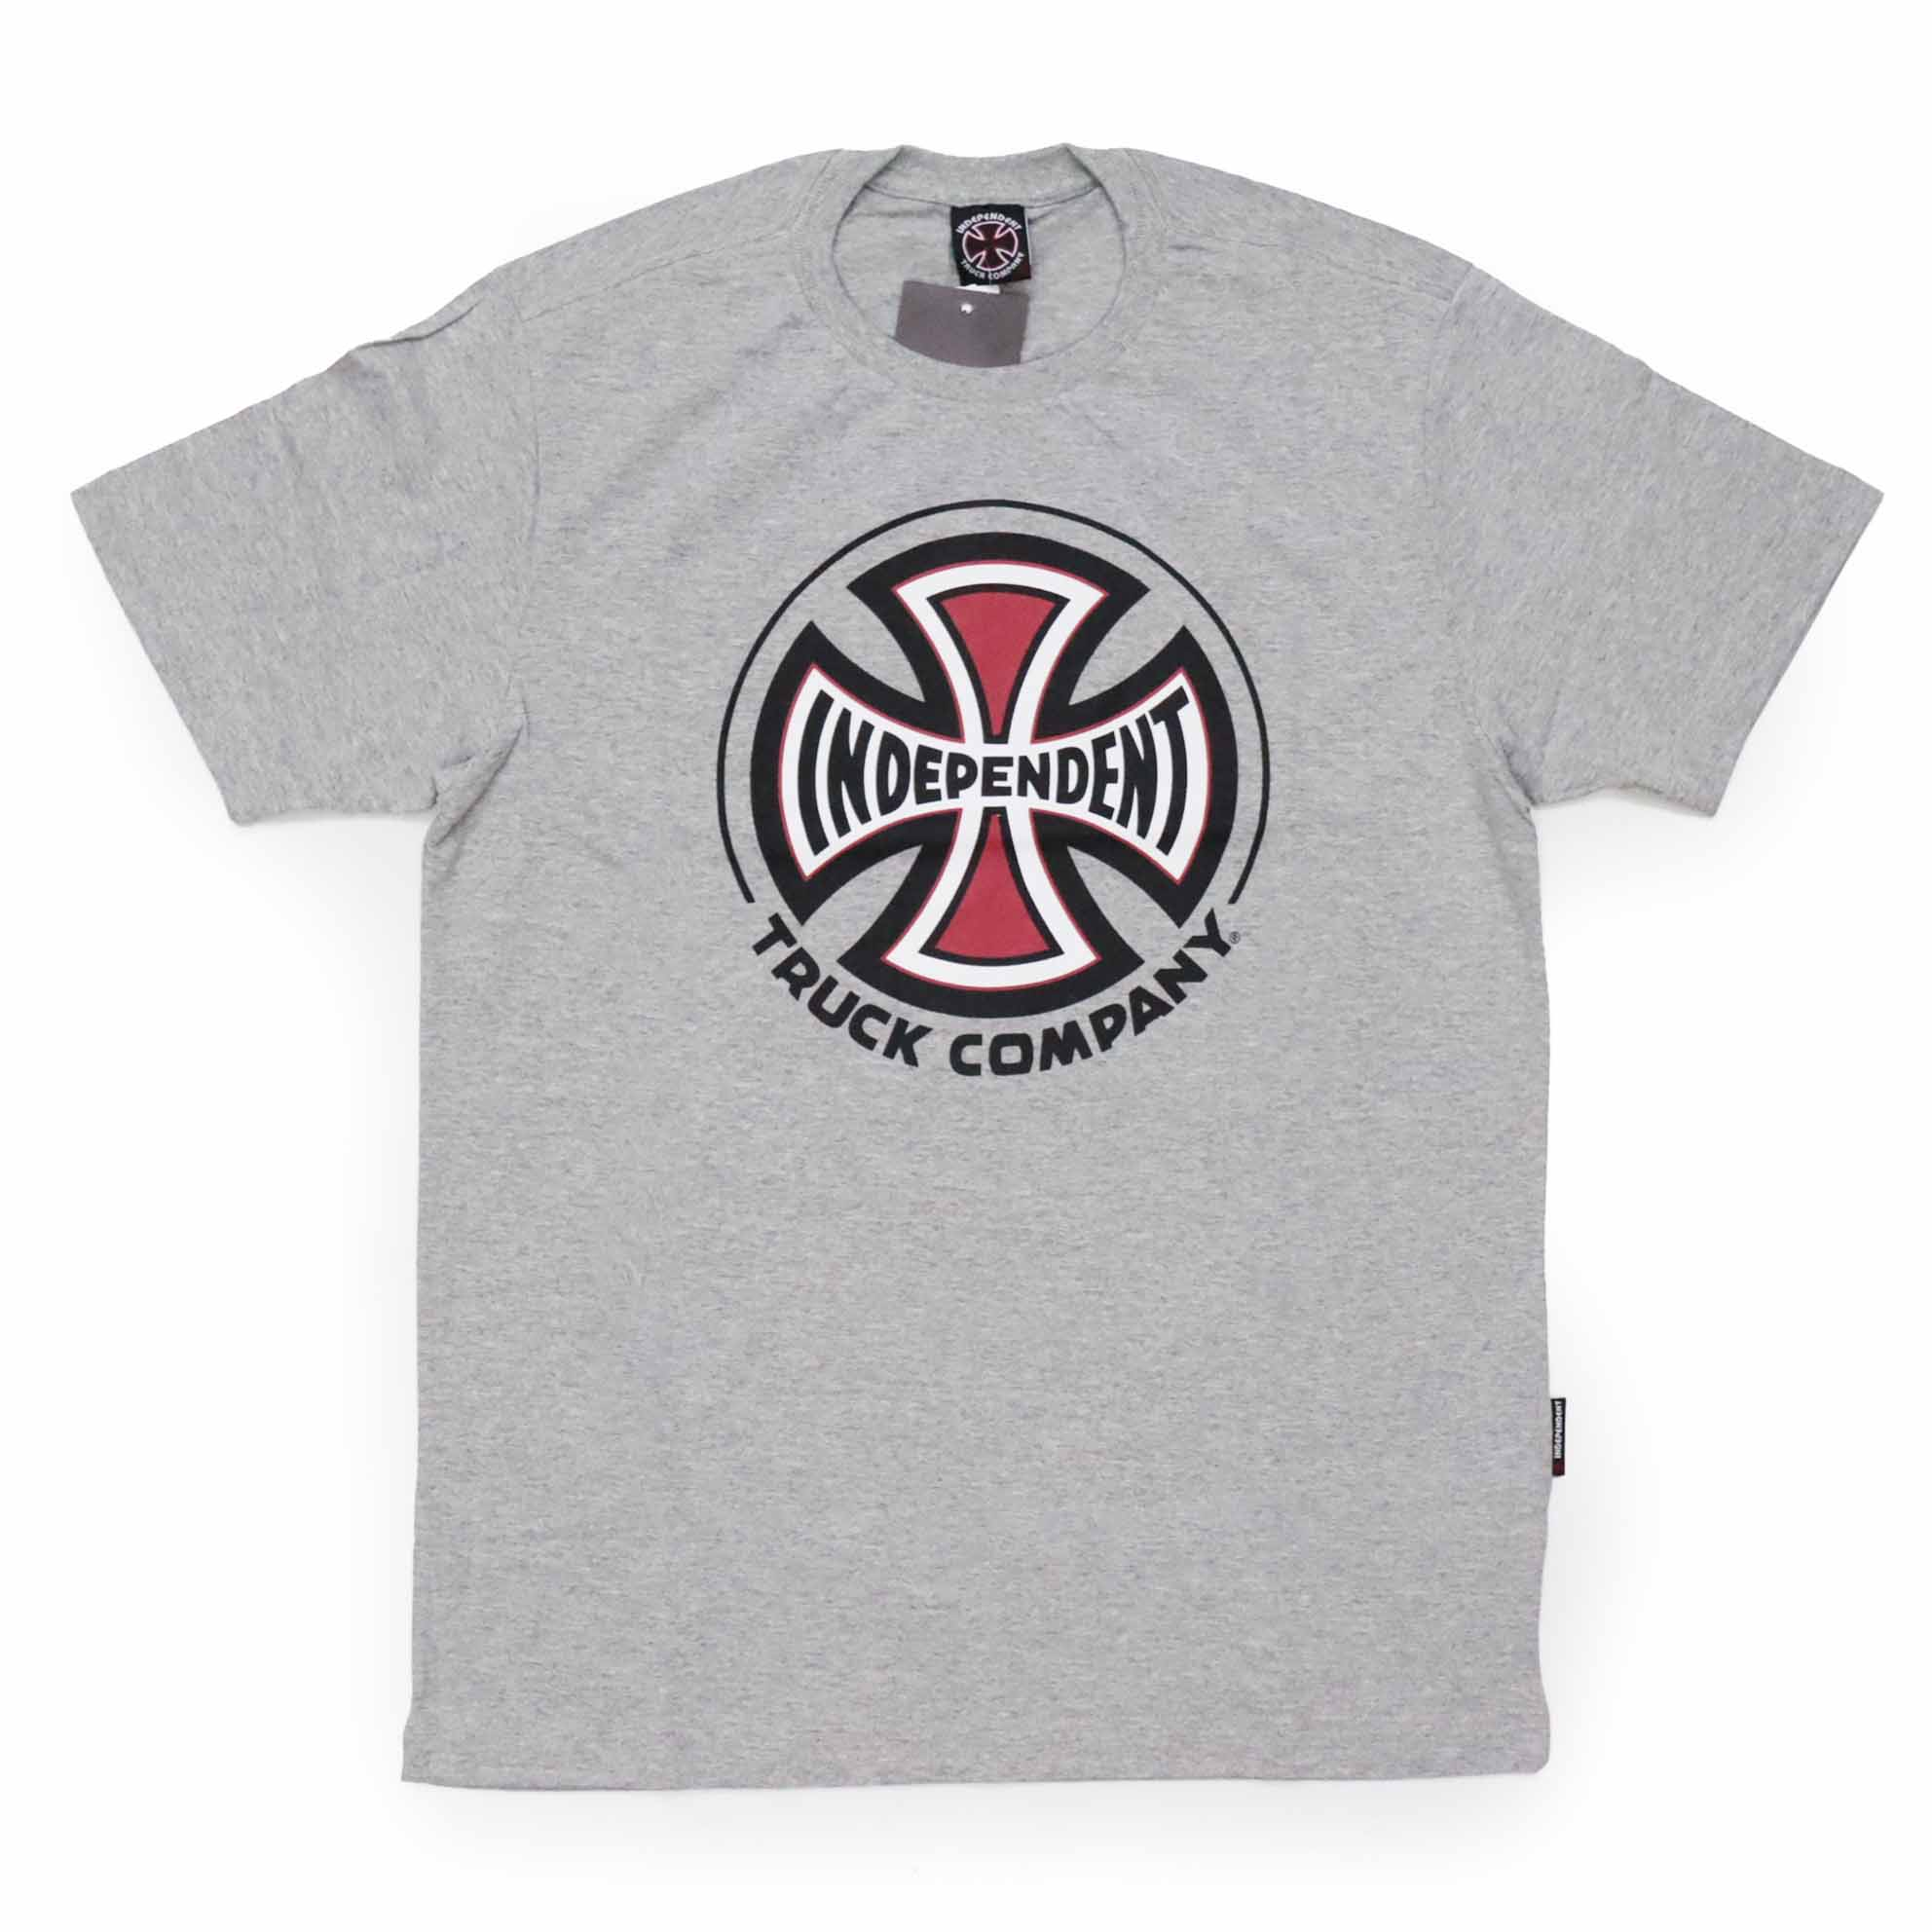 Camiseta Independent Truck Co 3 Colors - Cinza Mescla